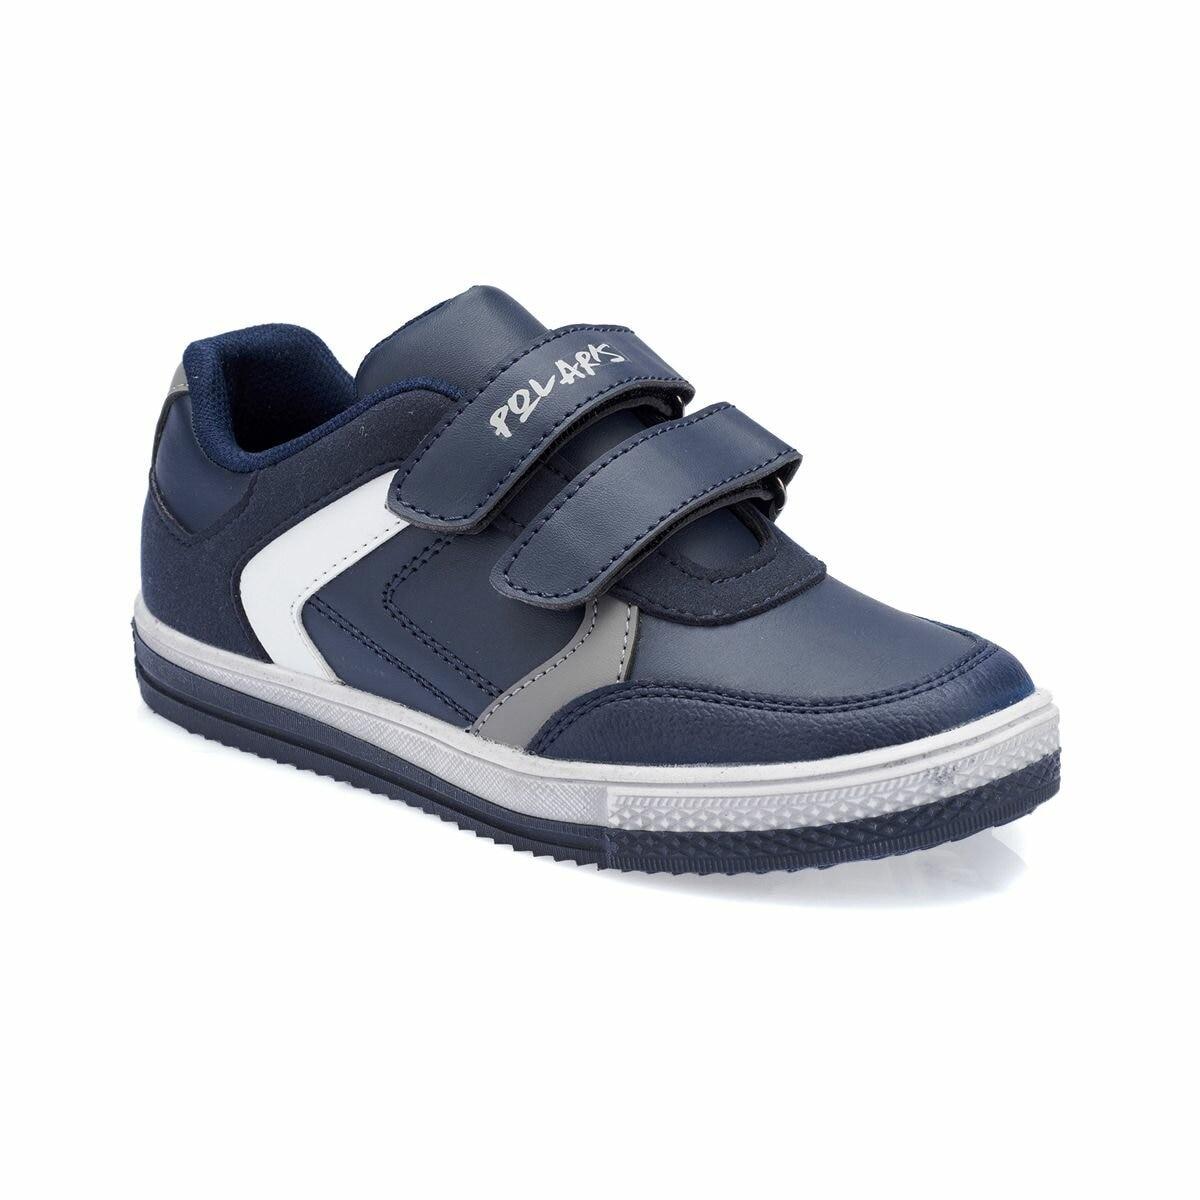 FLO 82.510605.F Navy Blue Male Child Shoes Polaris Sneakers     - title=